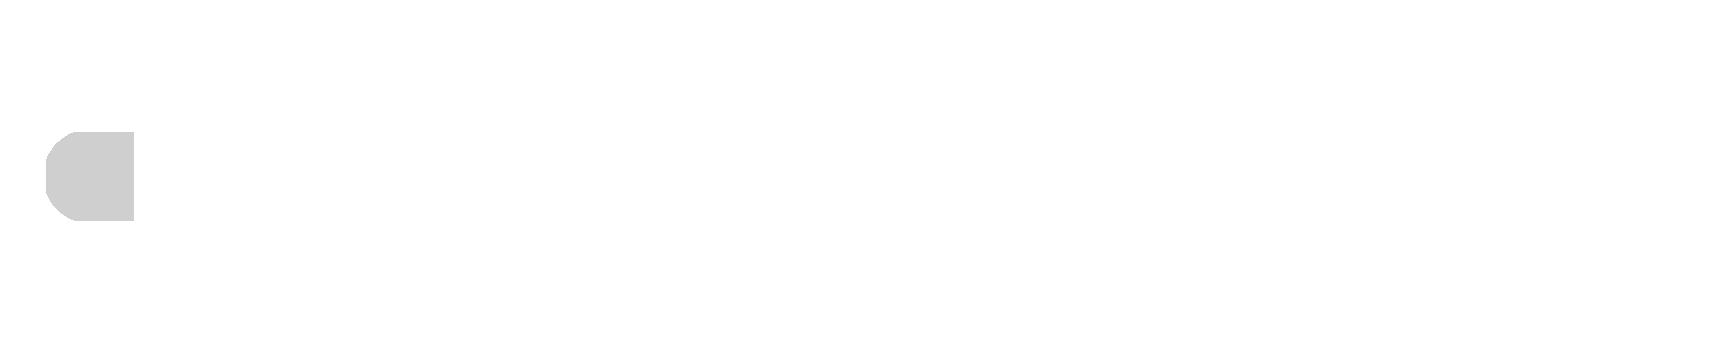 Daruclick logo